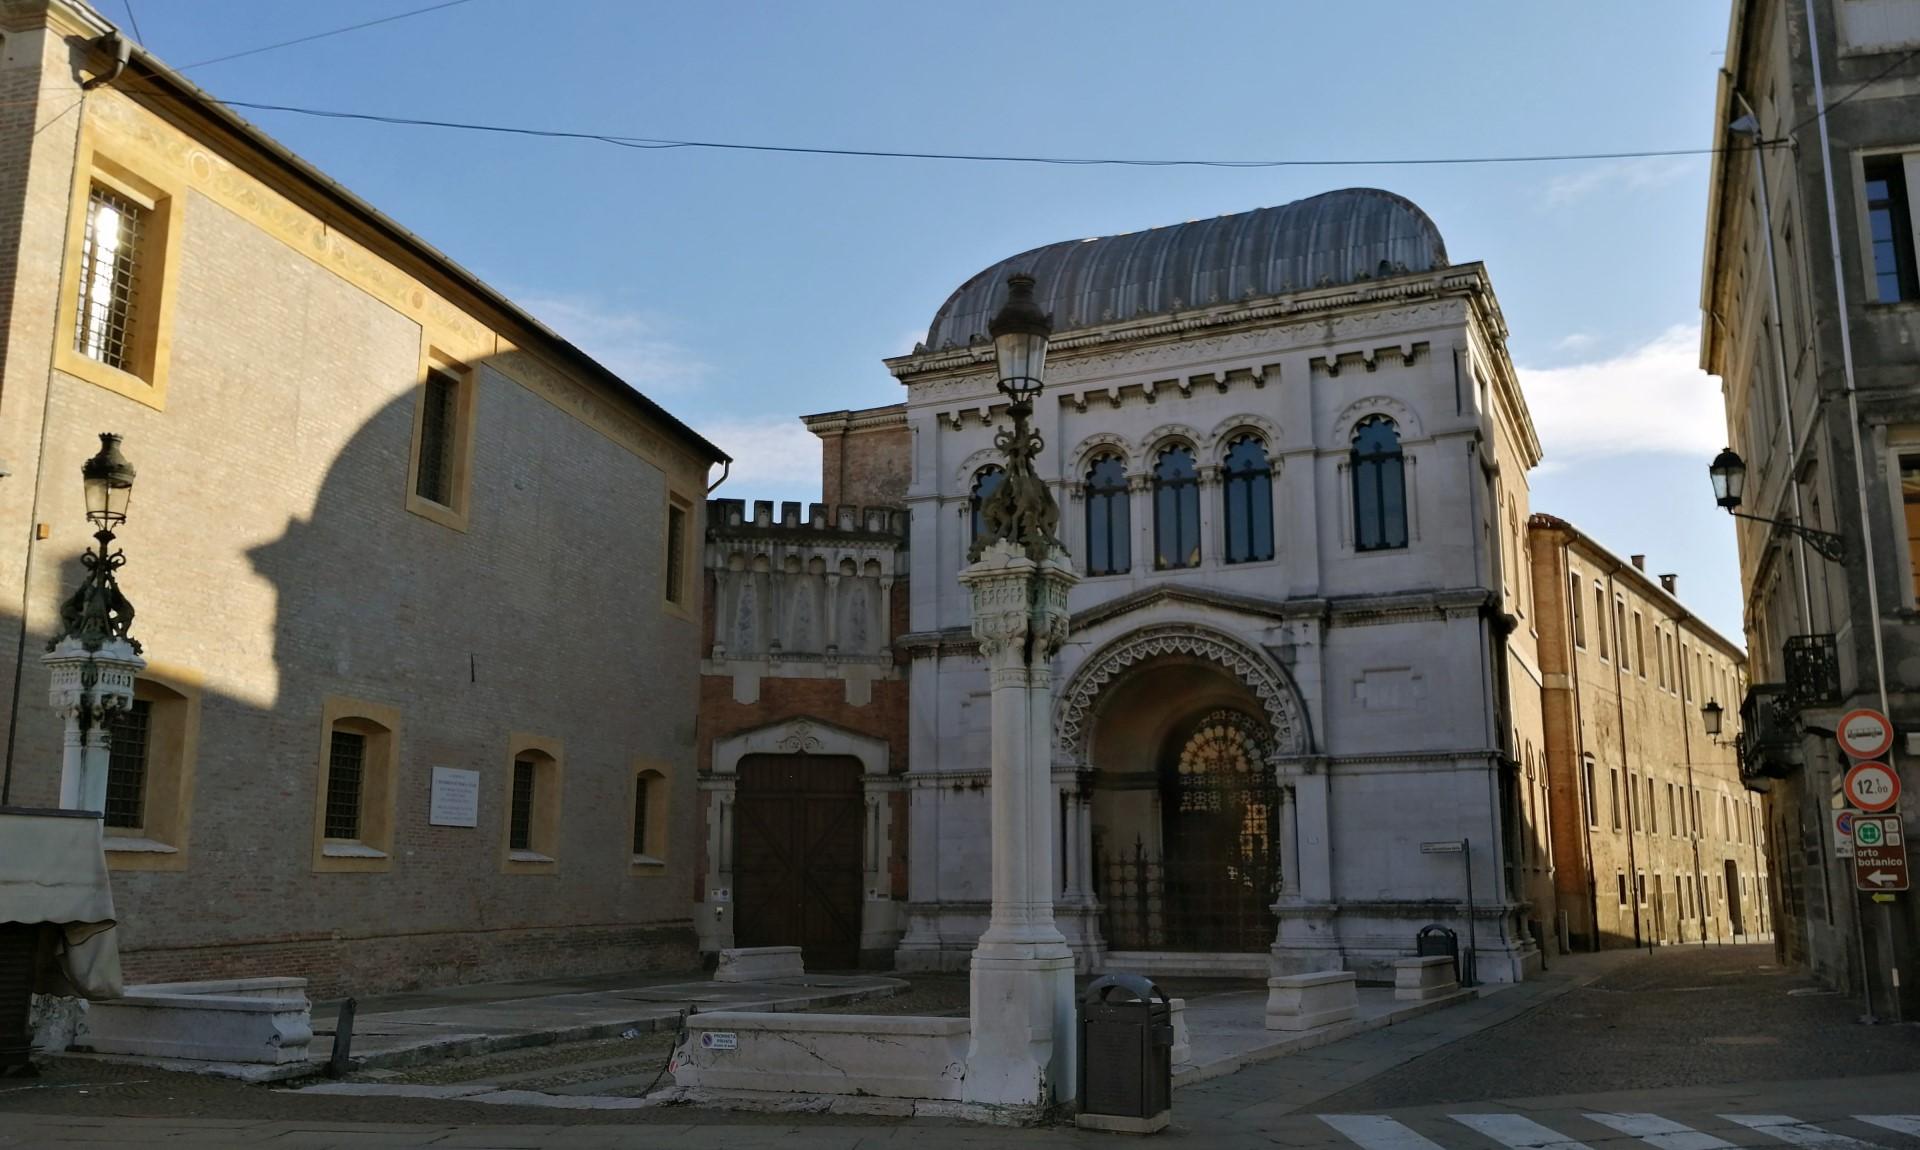 Piazzetta Kolbe Via Orto Botanico